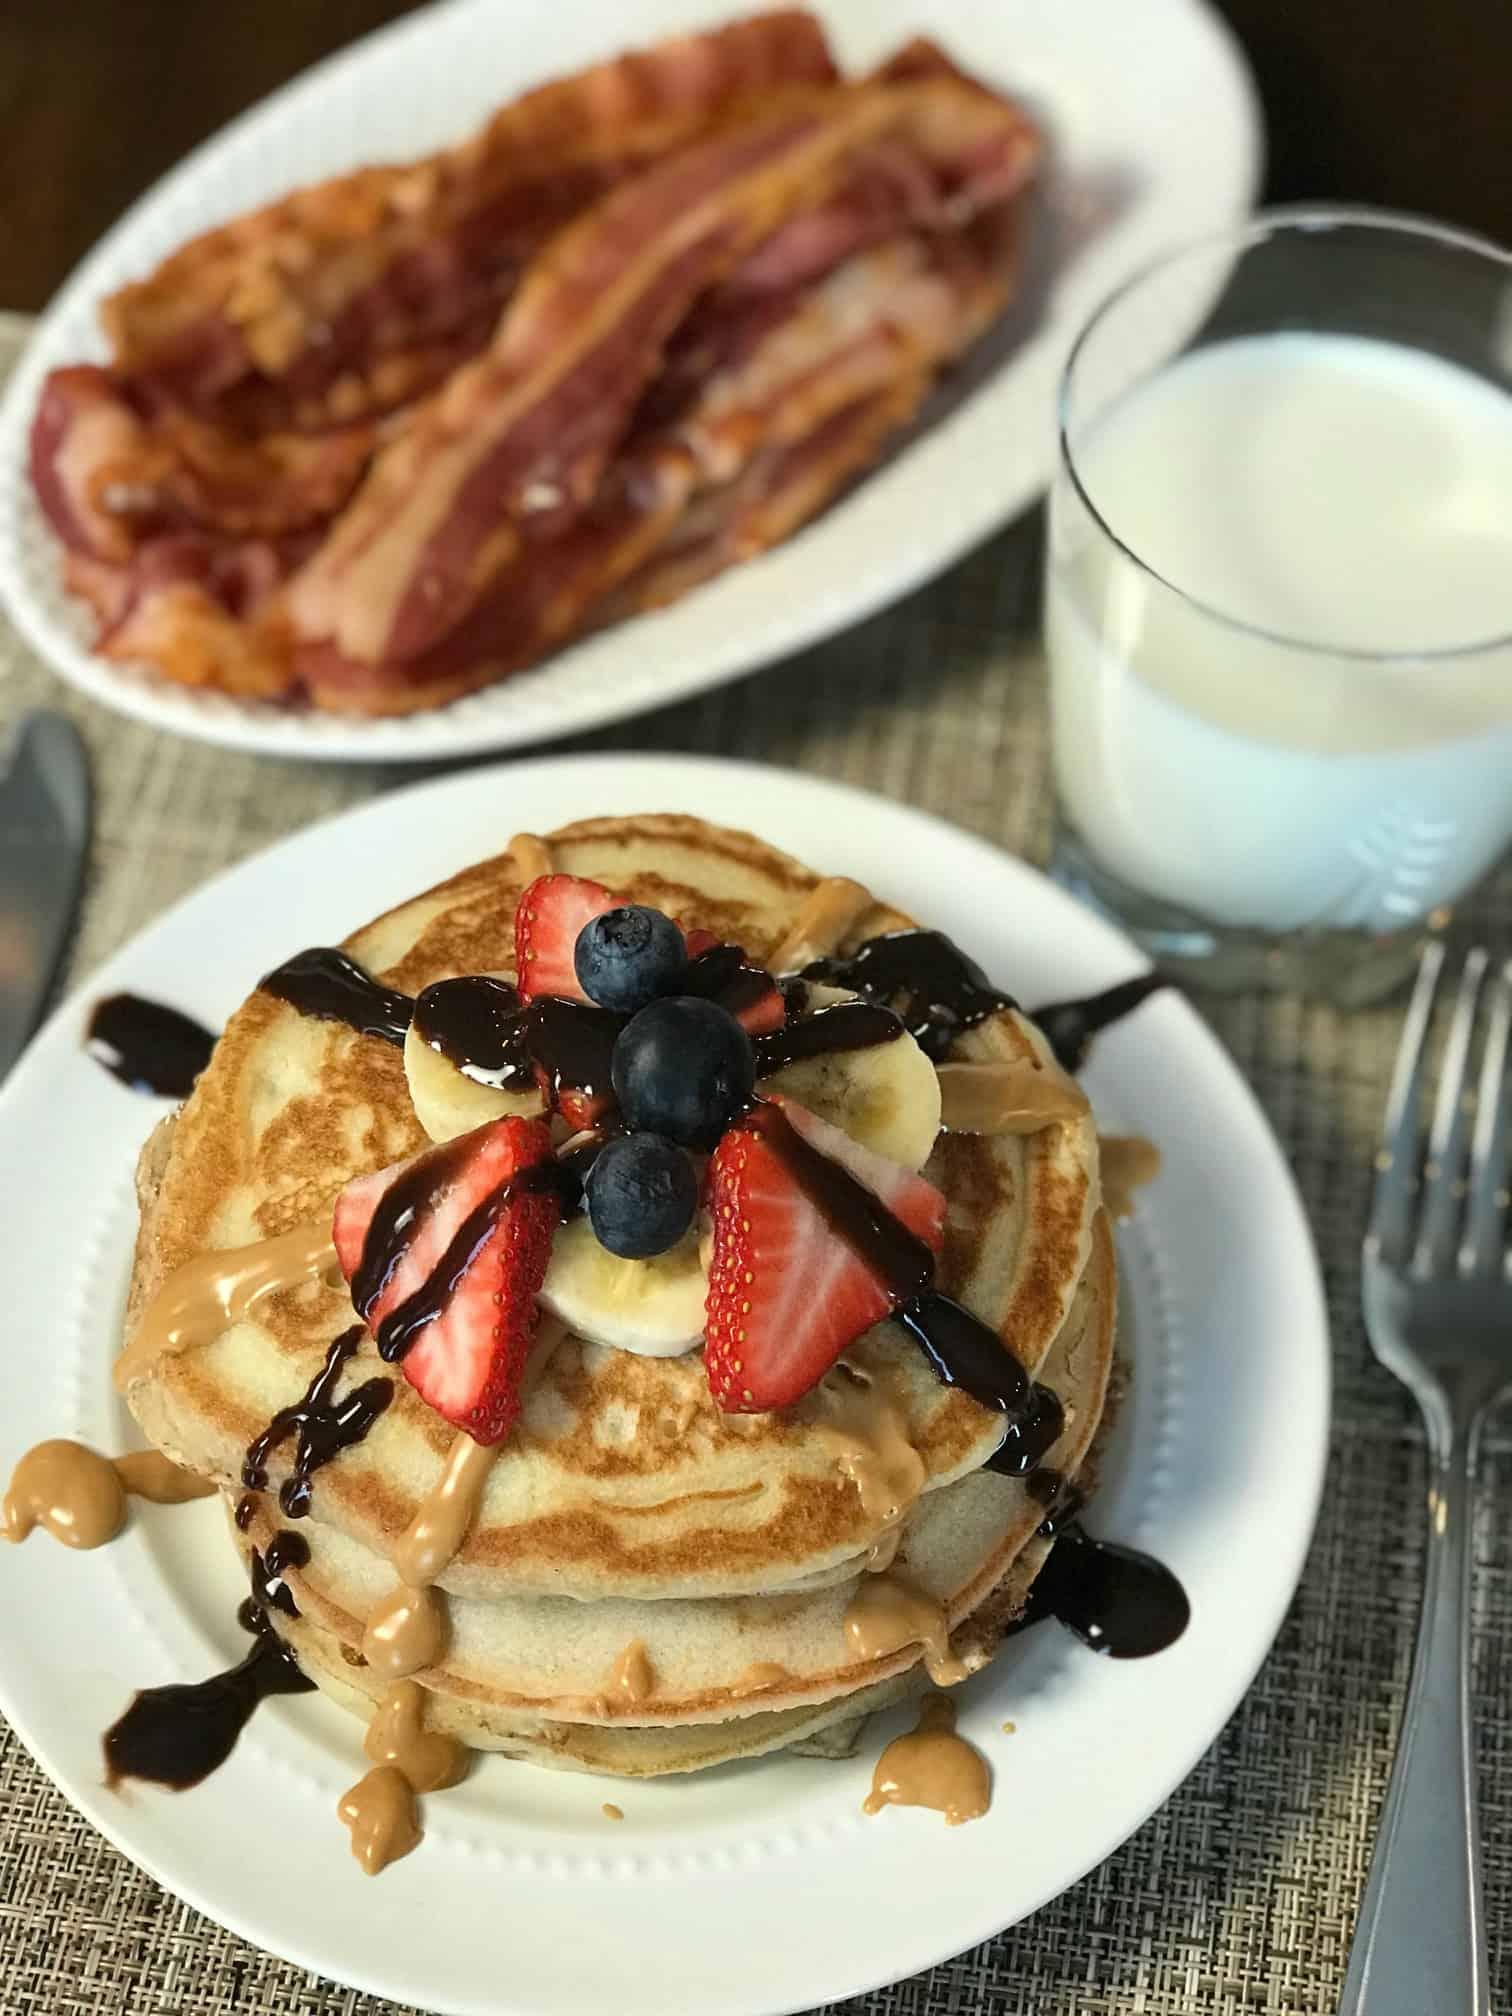 pancake and bacon